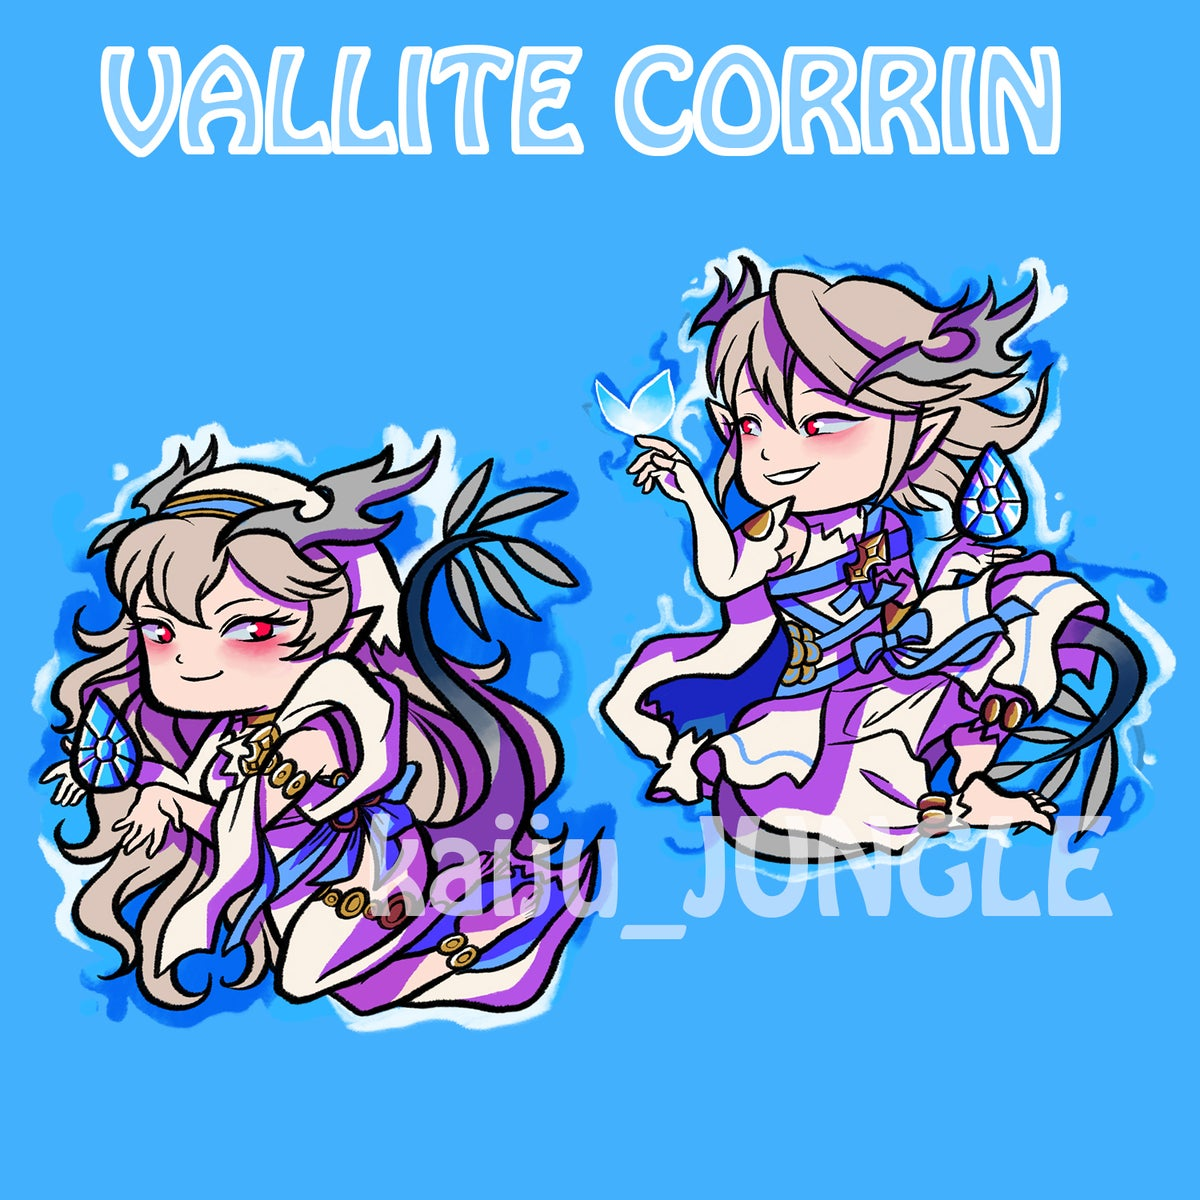 Image of fire emblem vallite corrins